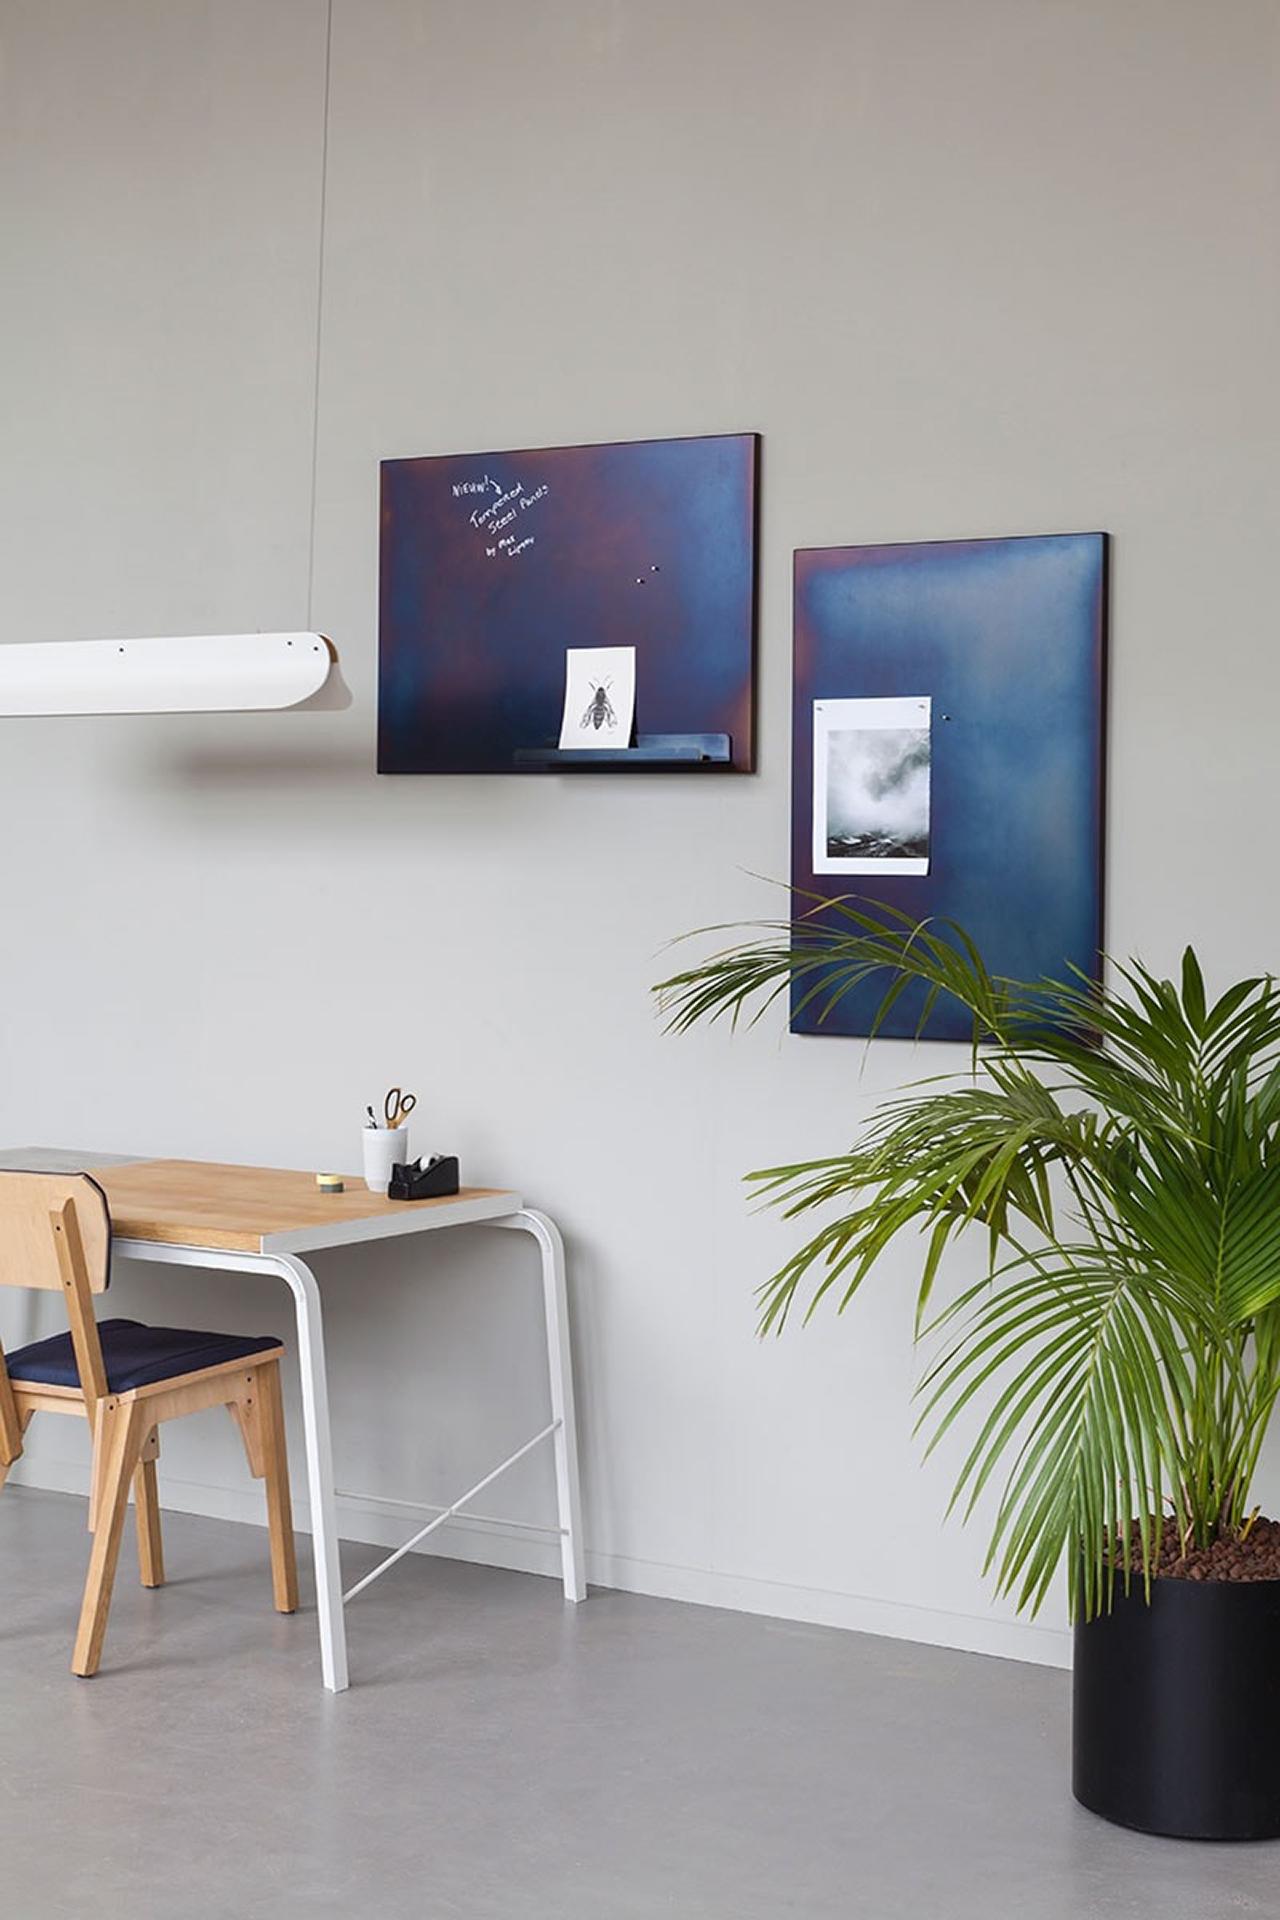 wall shelves and desk